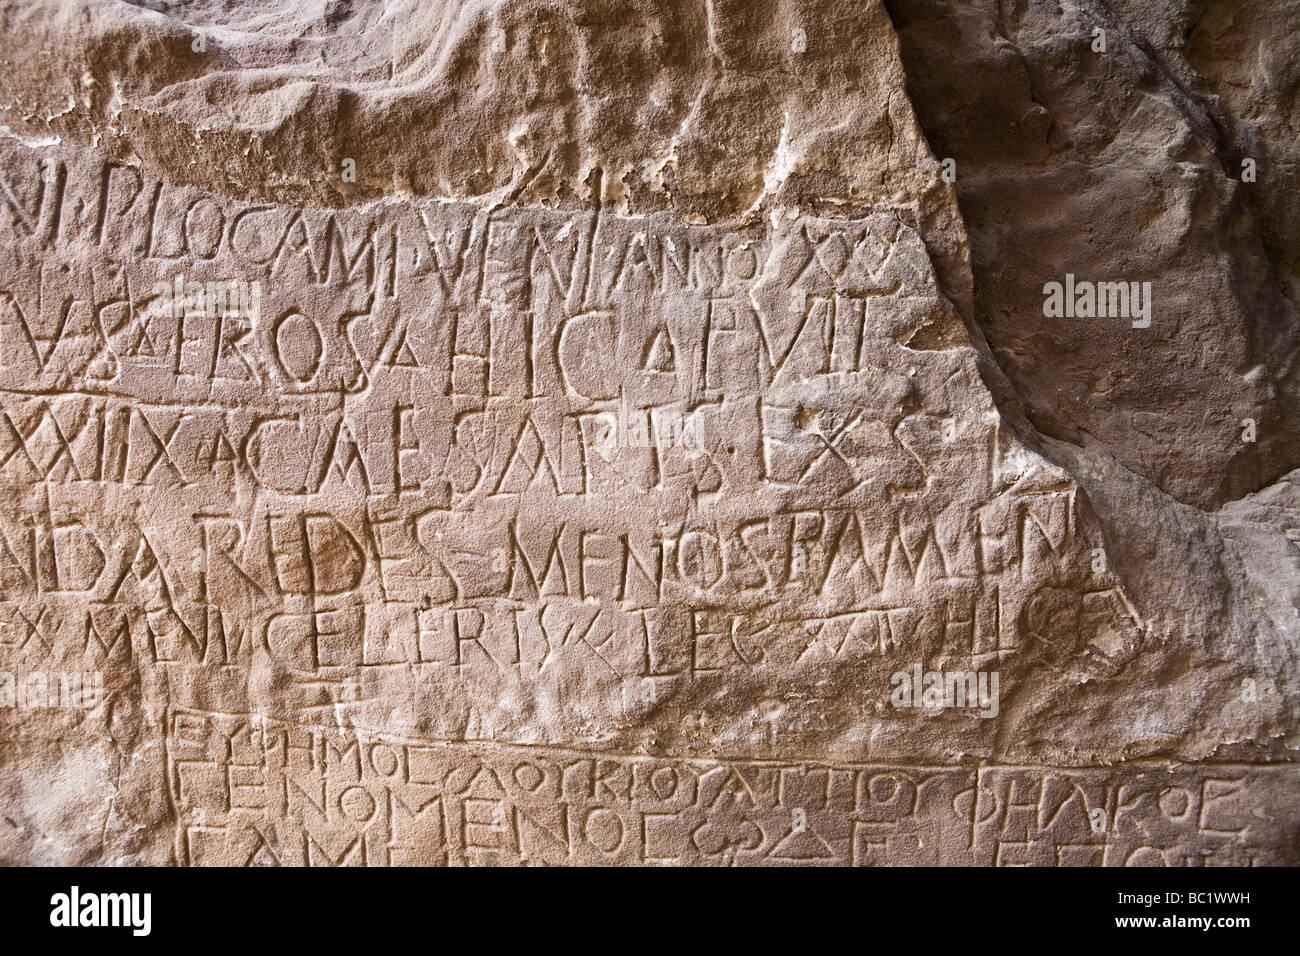 Rock-art inscriptions in the Eastern Desert of Egypt, North Africa - Stock Image